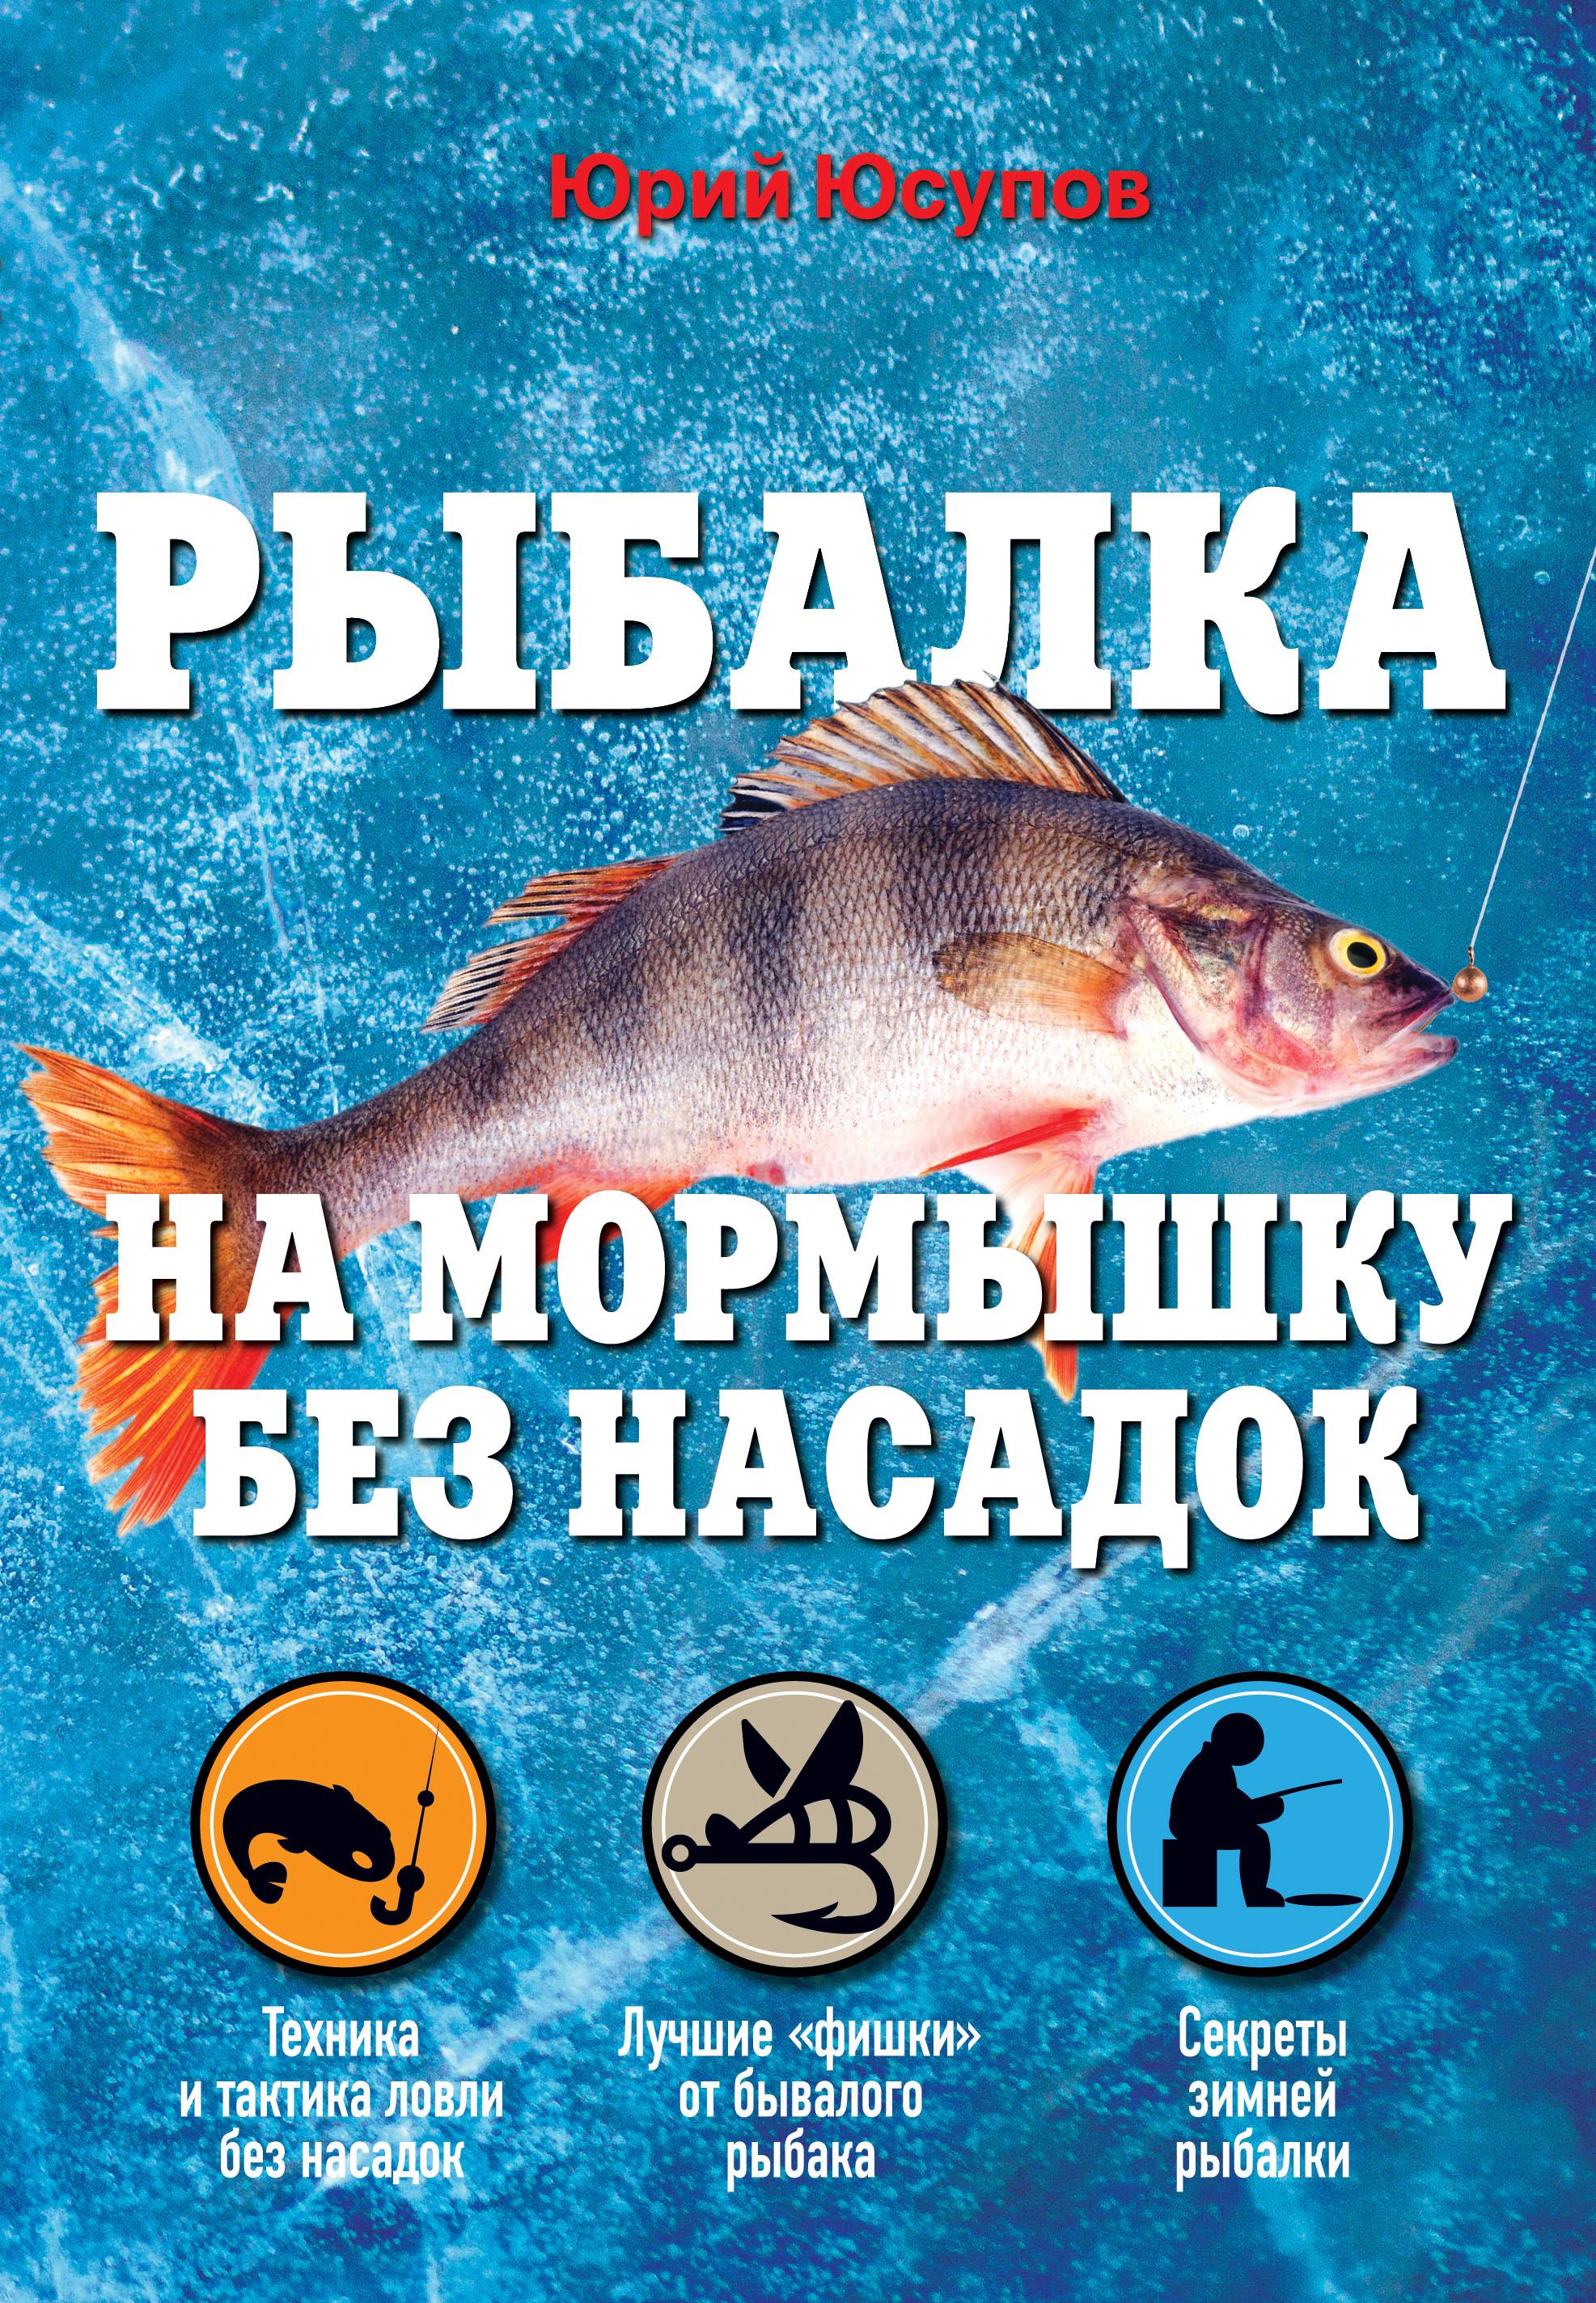 Юсупов Ю.К. Рыбалка на мормышку без насадок мормышку гвоздешарик